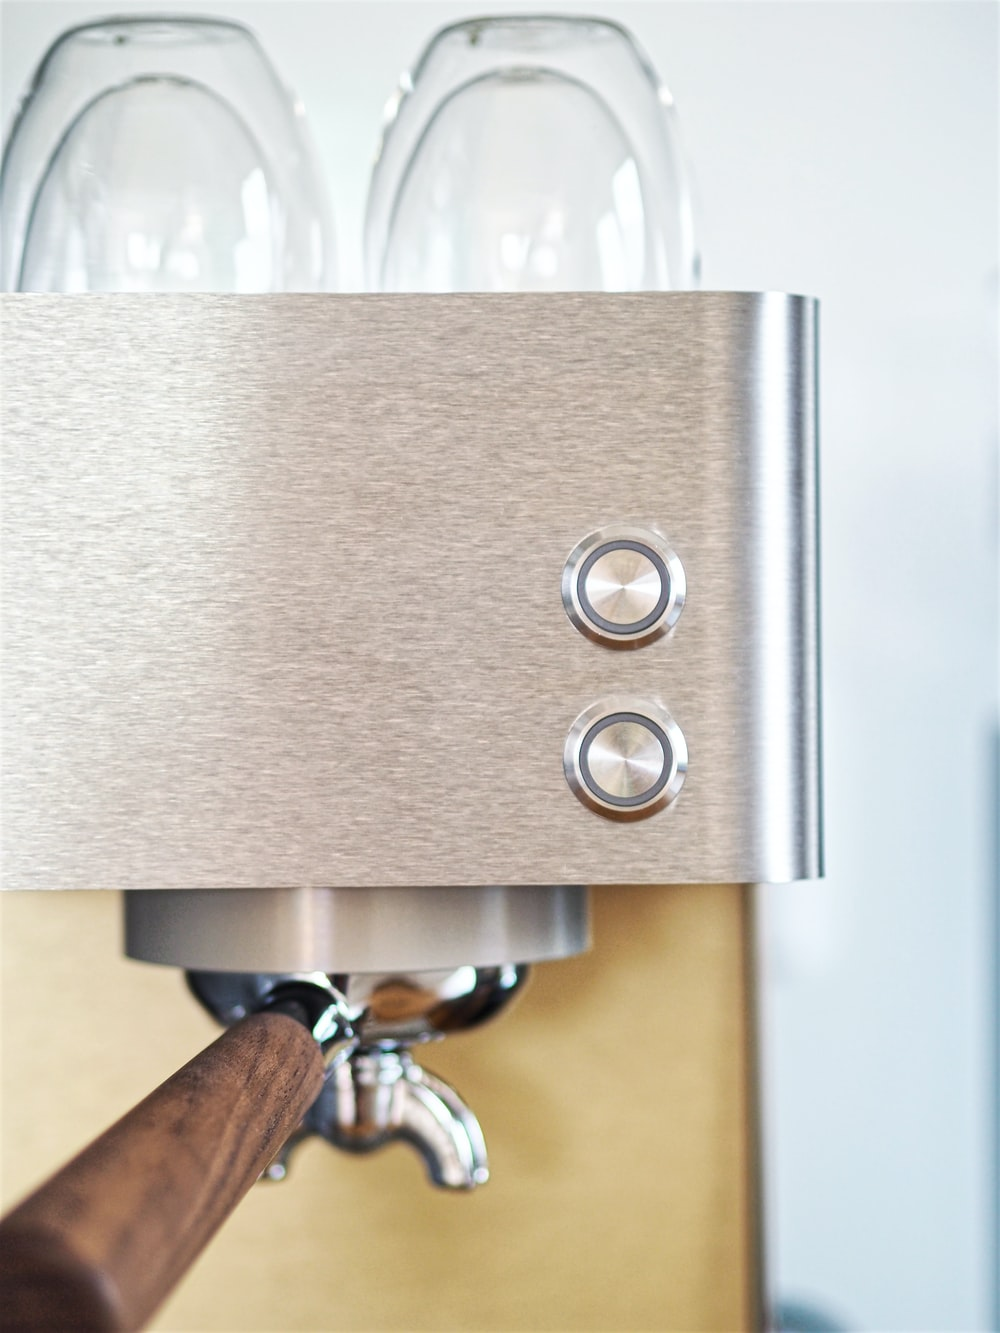 gray espresso maker